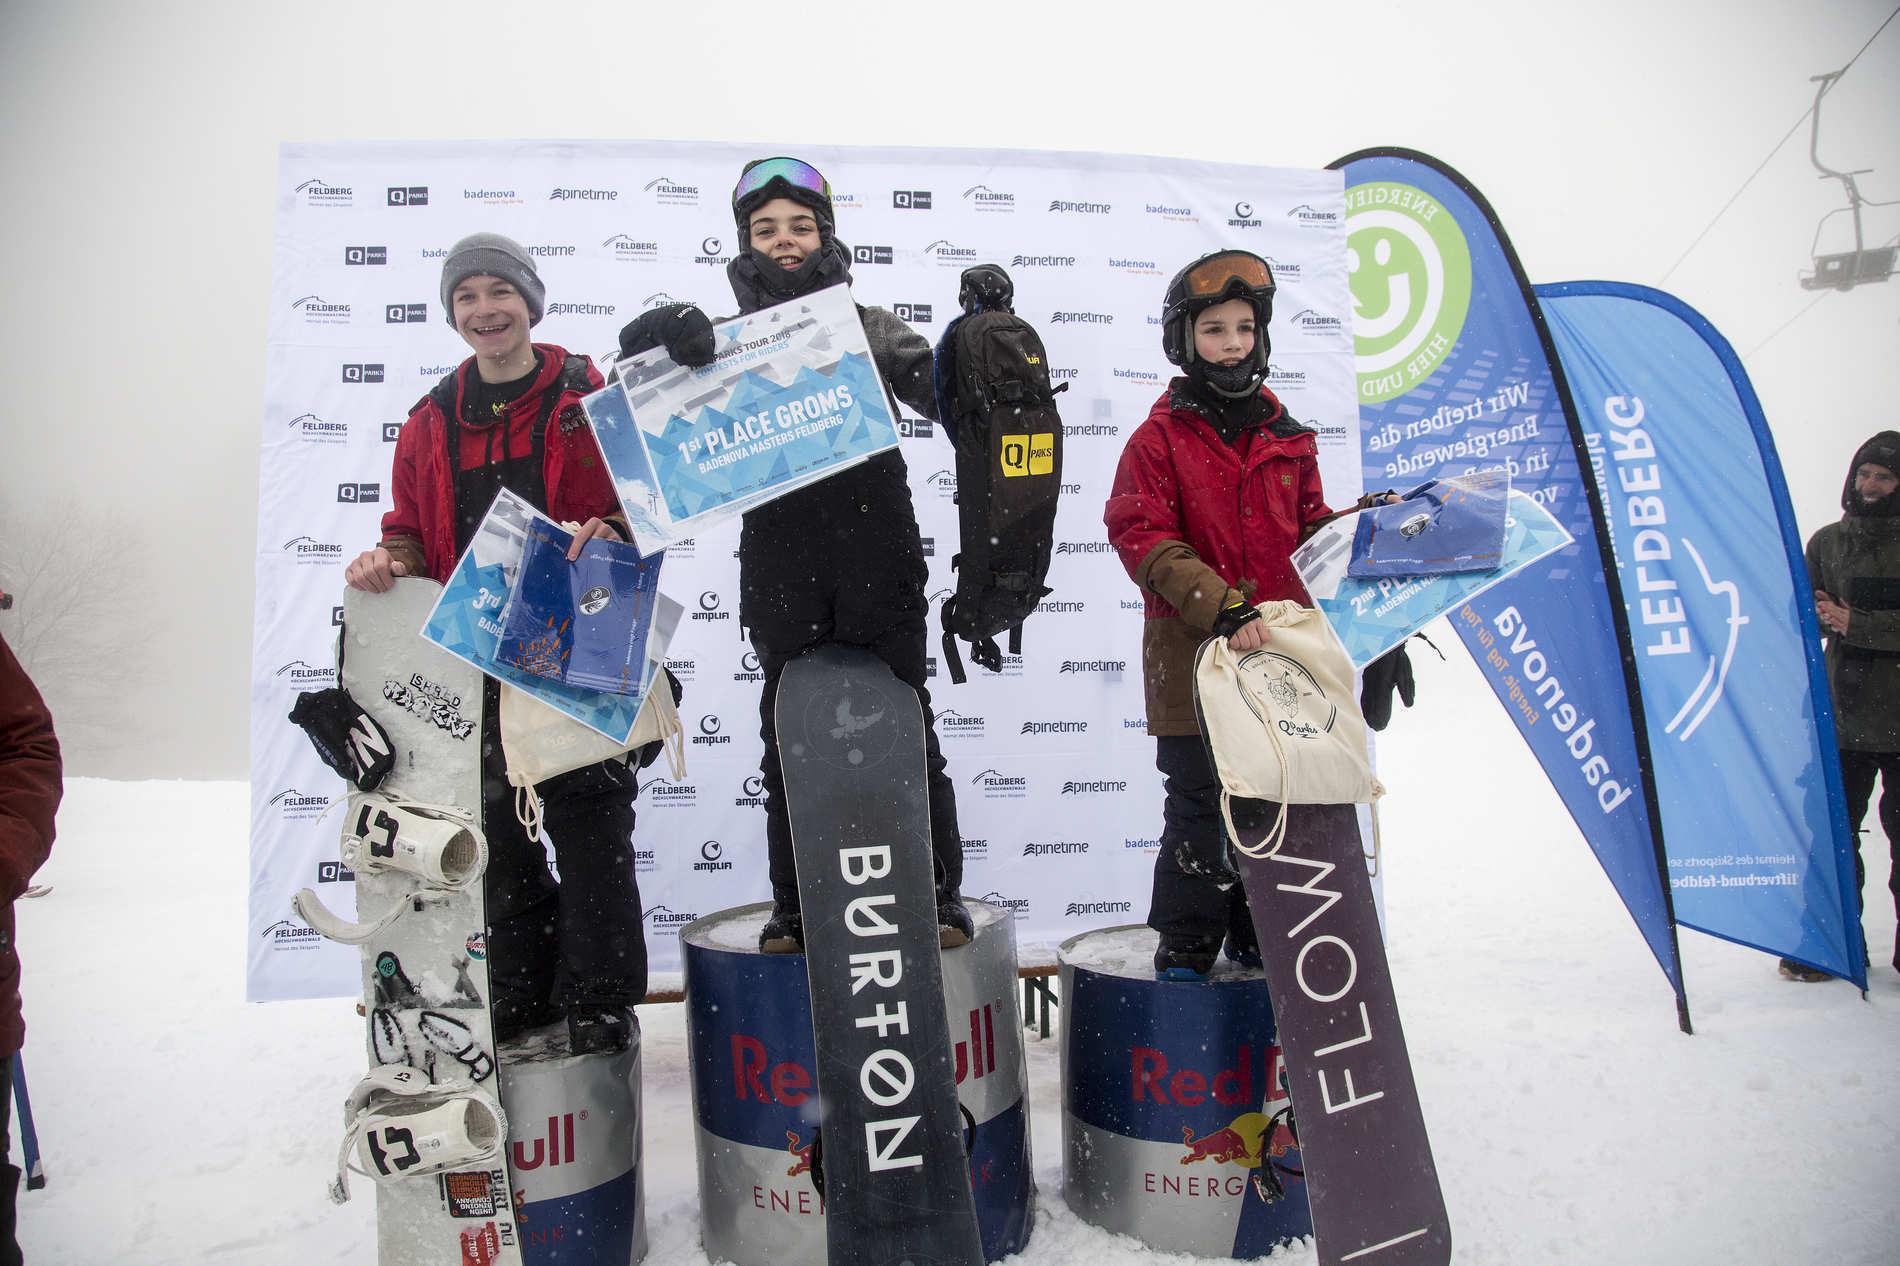 web snowpark feldberg 17 02 2018 lifestyle fs sb martin herrmann qparks 27